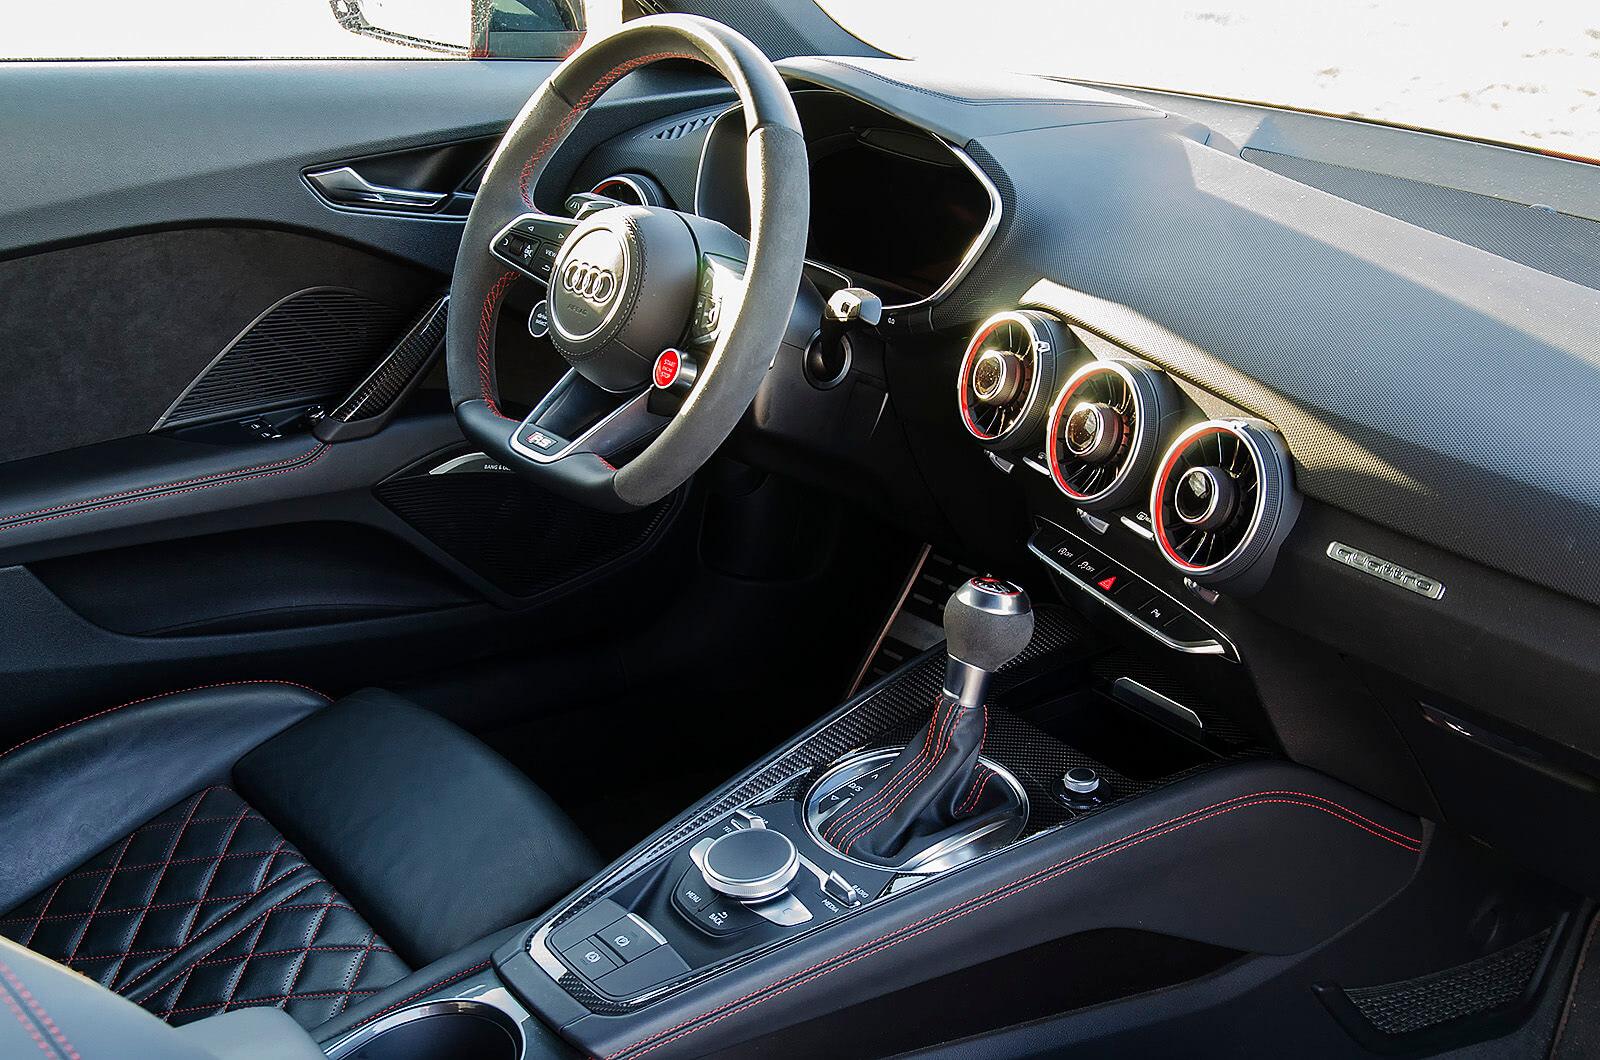 Audi - Audi TTRS - férfimagazin - teszt